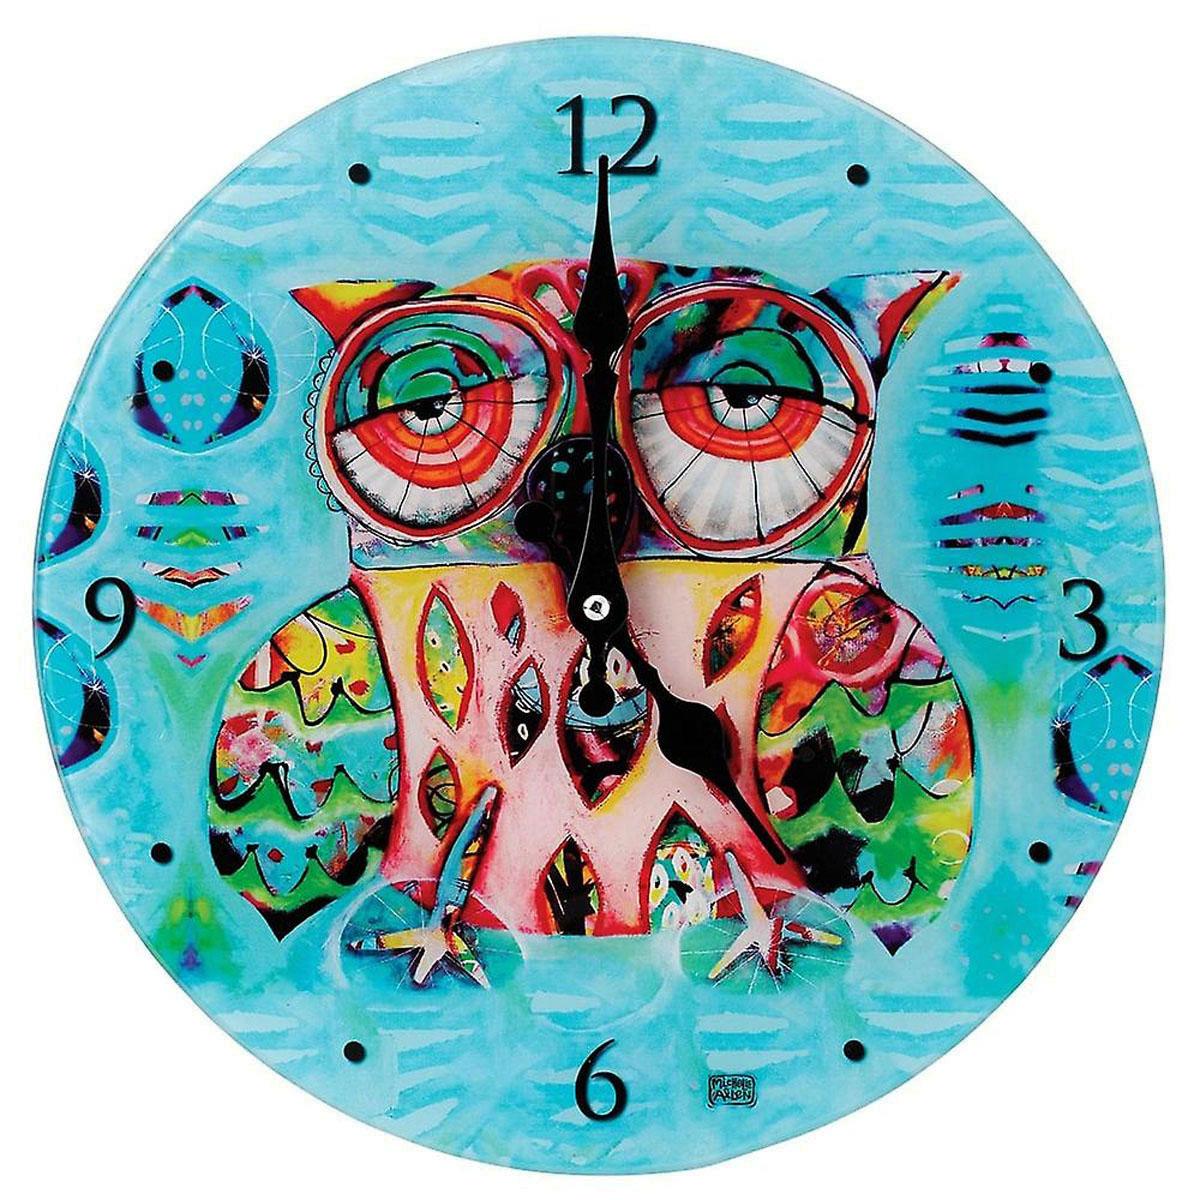 Horloge Murale verre \'Allen Designs\' chouette (30 cm) - [M1335]